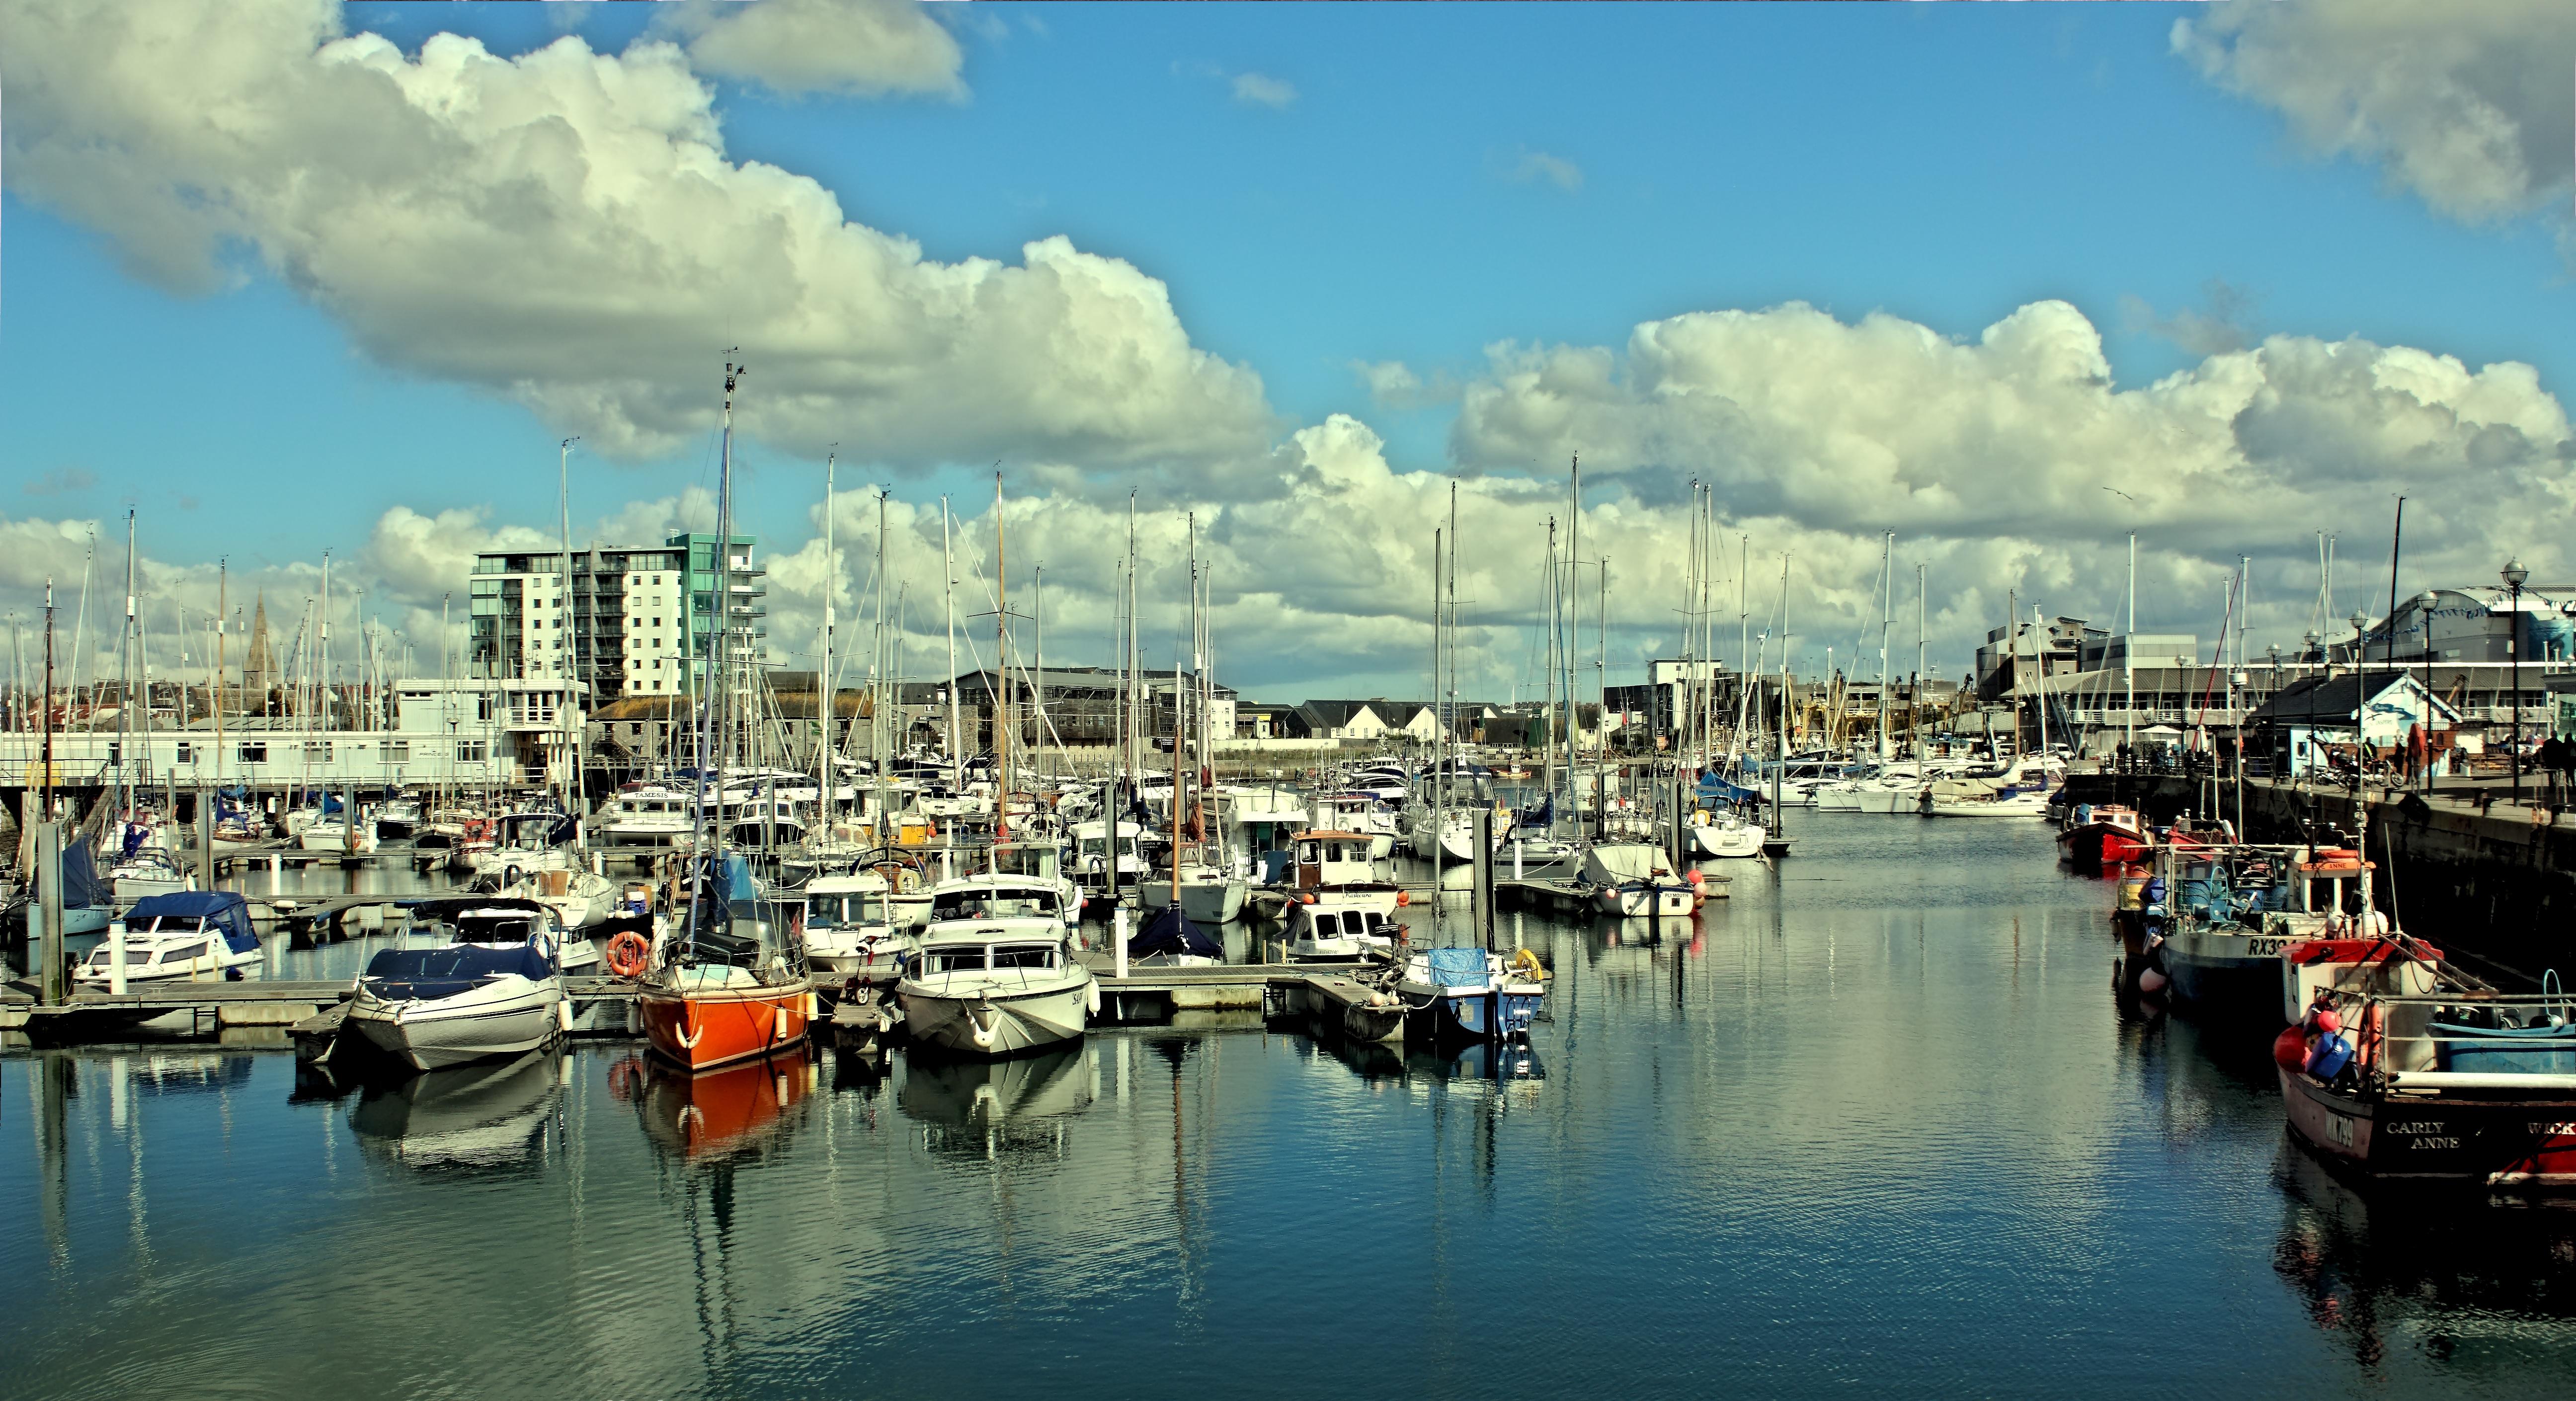 Koppla in Devon port